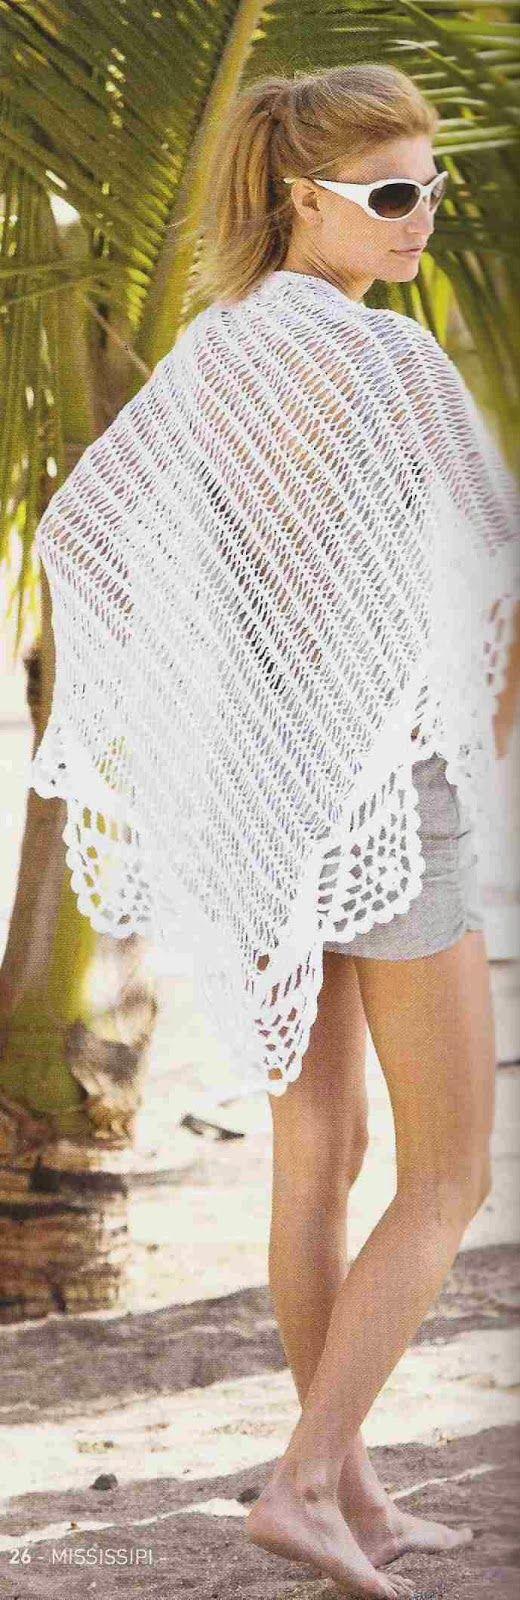 Patrón #68: Chal o Poncho Blanco a Crochet. Patrón #68: Chal o Poncho Blanco a…